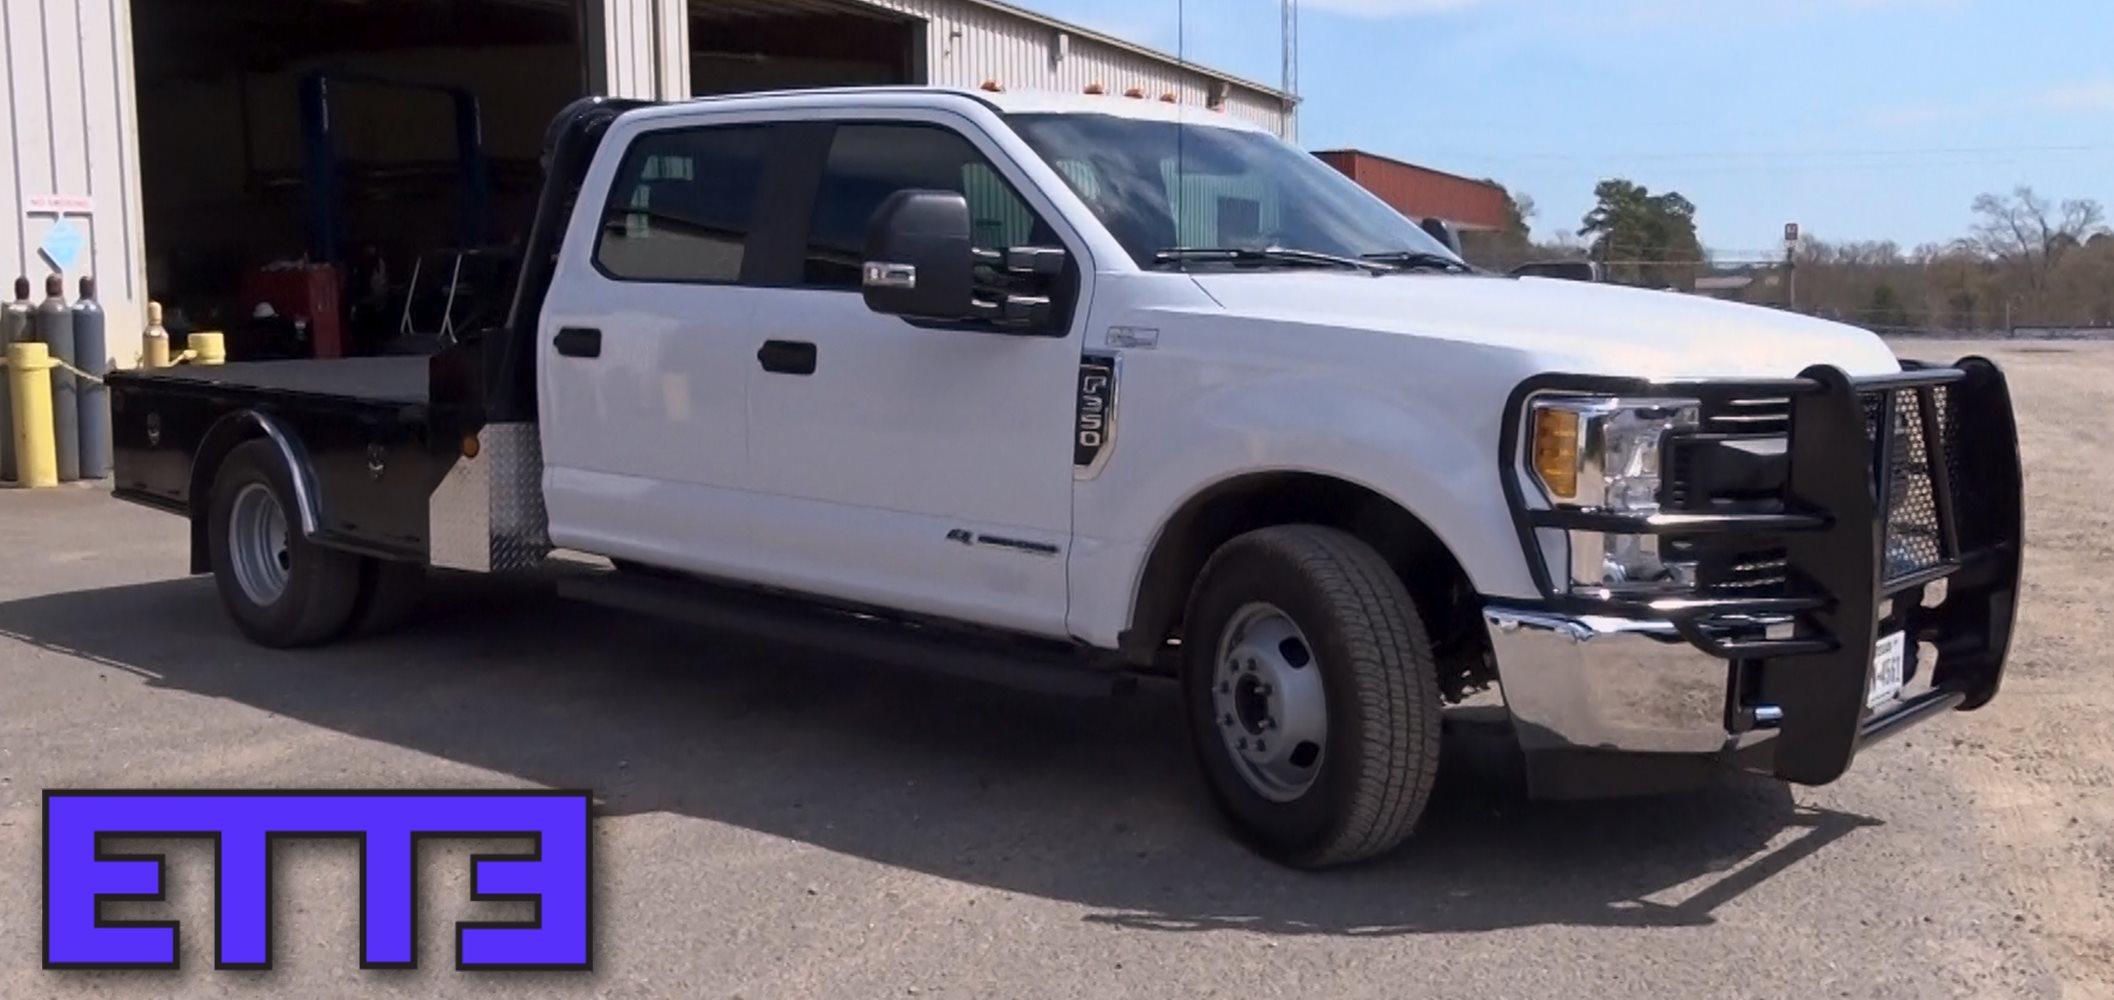 East Texas Truck Equipment